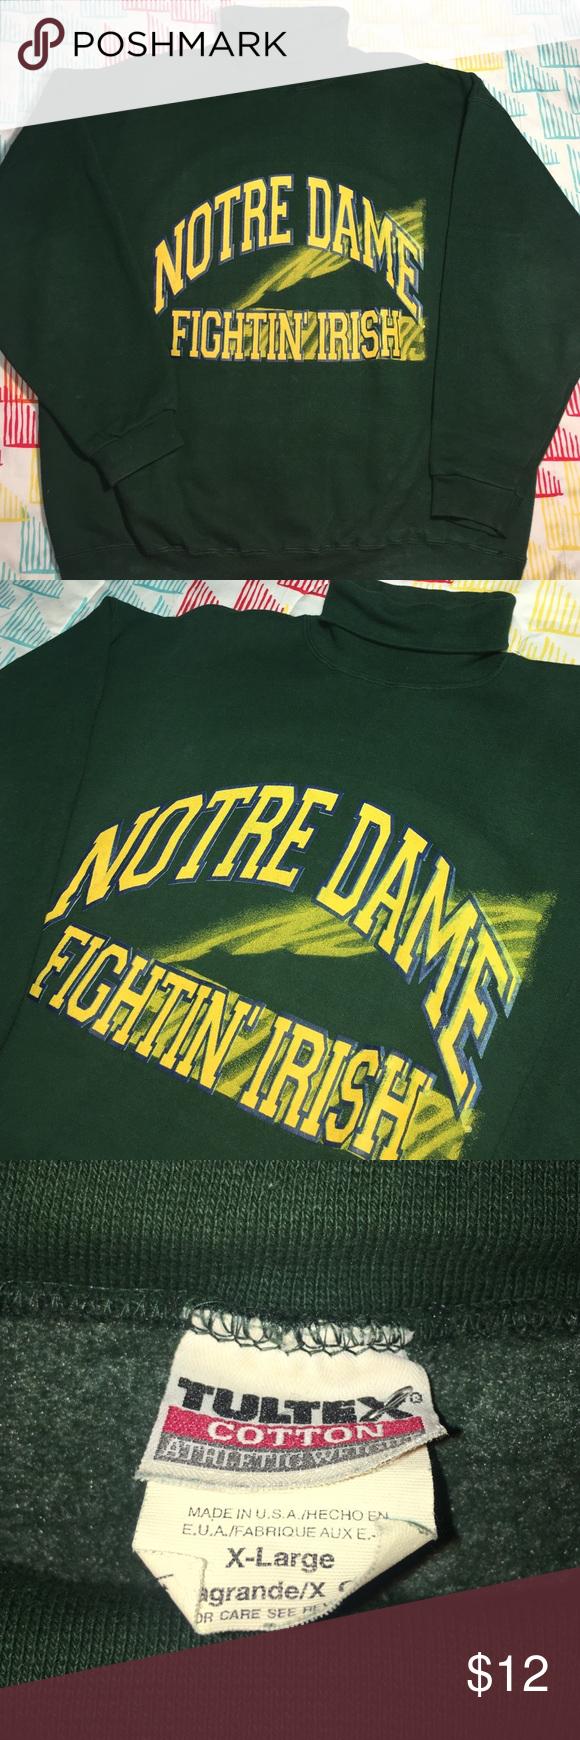 Notre Dame Fighting Irish Turtleneck Sweatshirt Size XL - Condition 9/10 tultex Shirts Sweatshirts & Hoodies